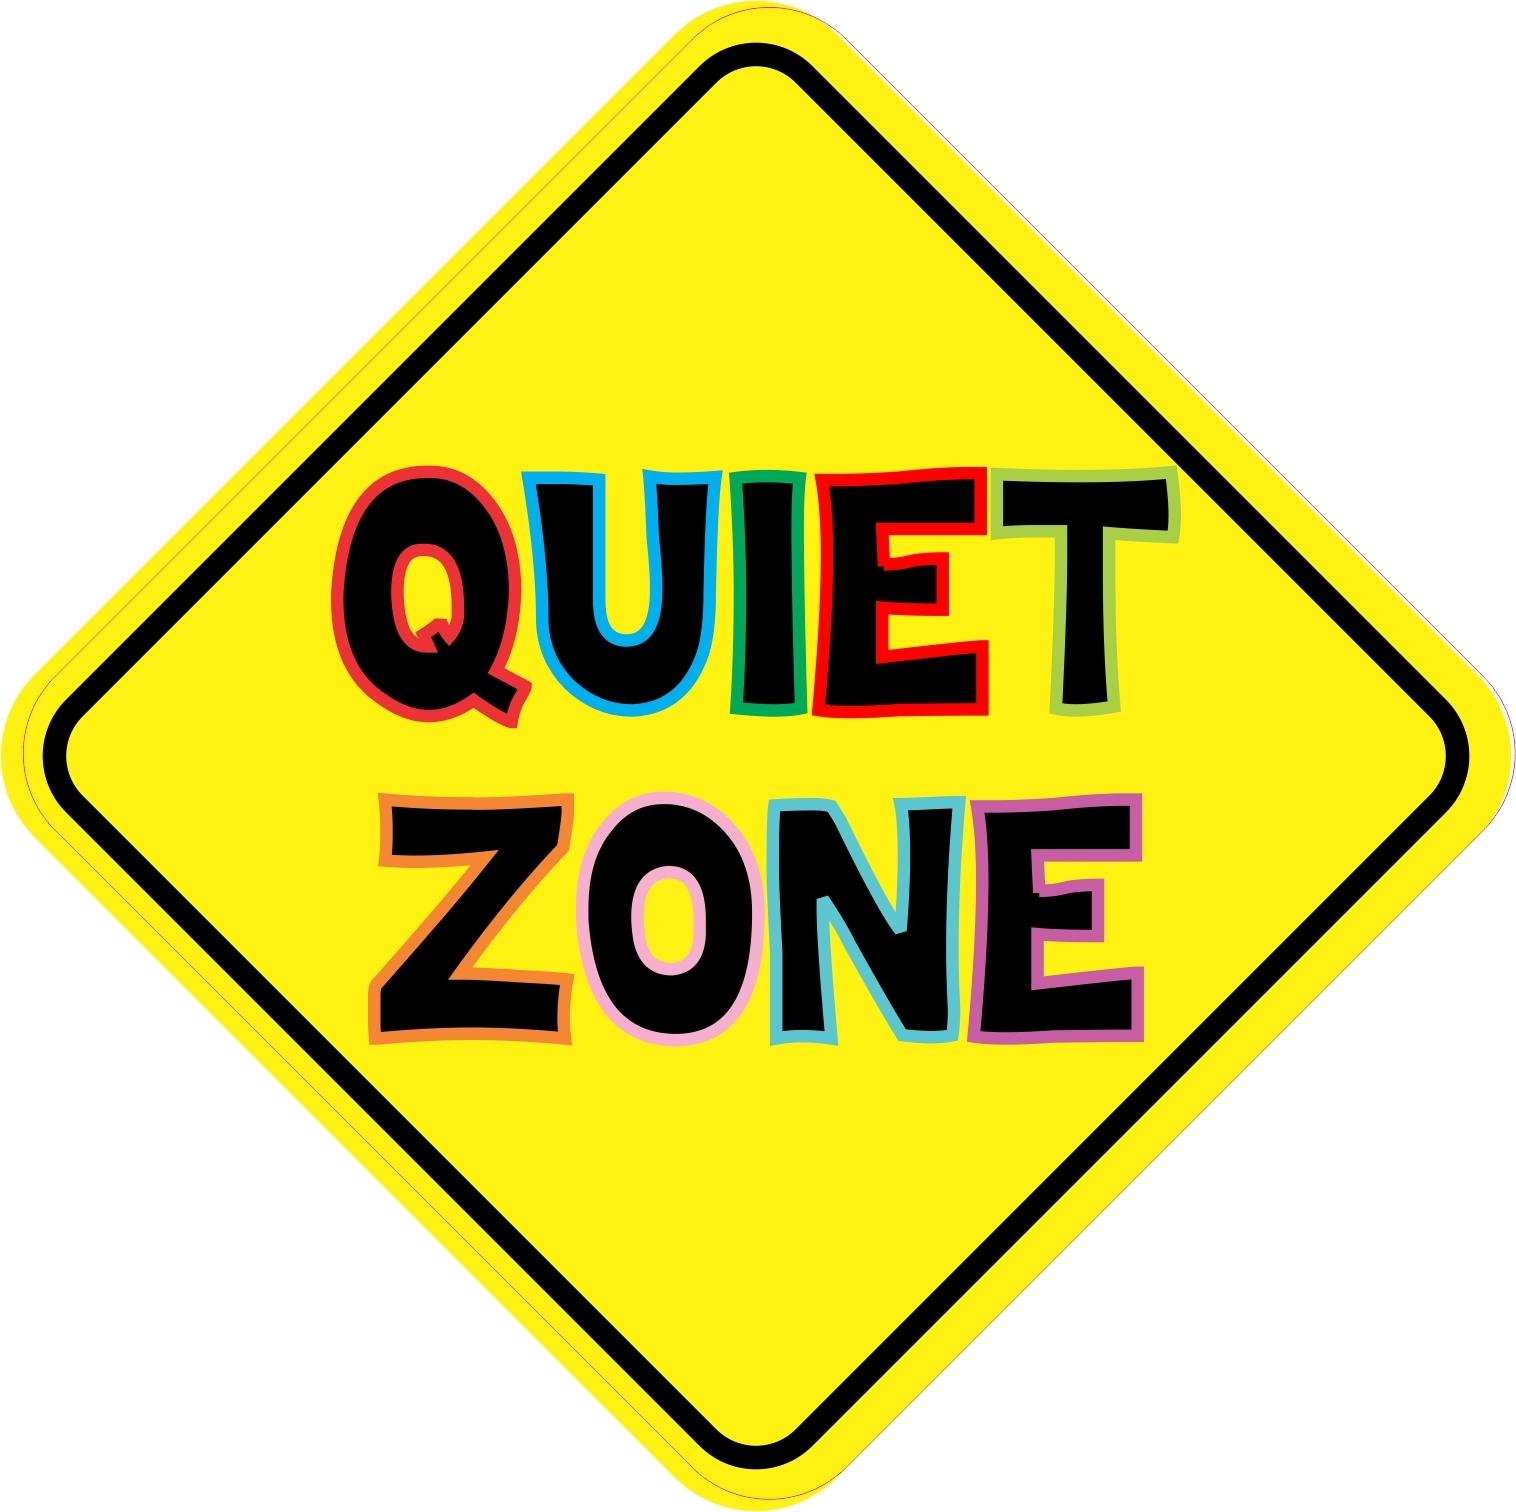 free clipart quiet zone - photo #2